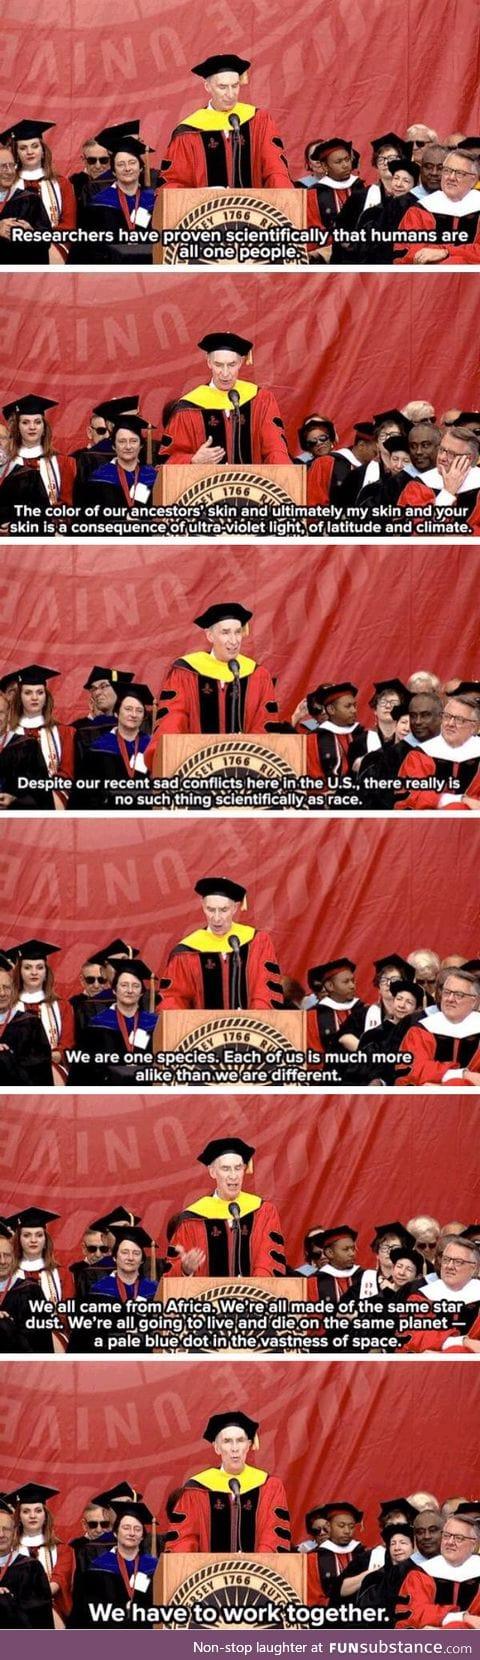 Bill Nye talking about race